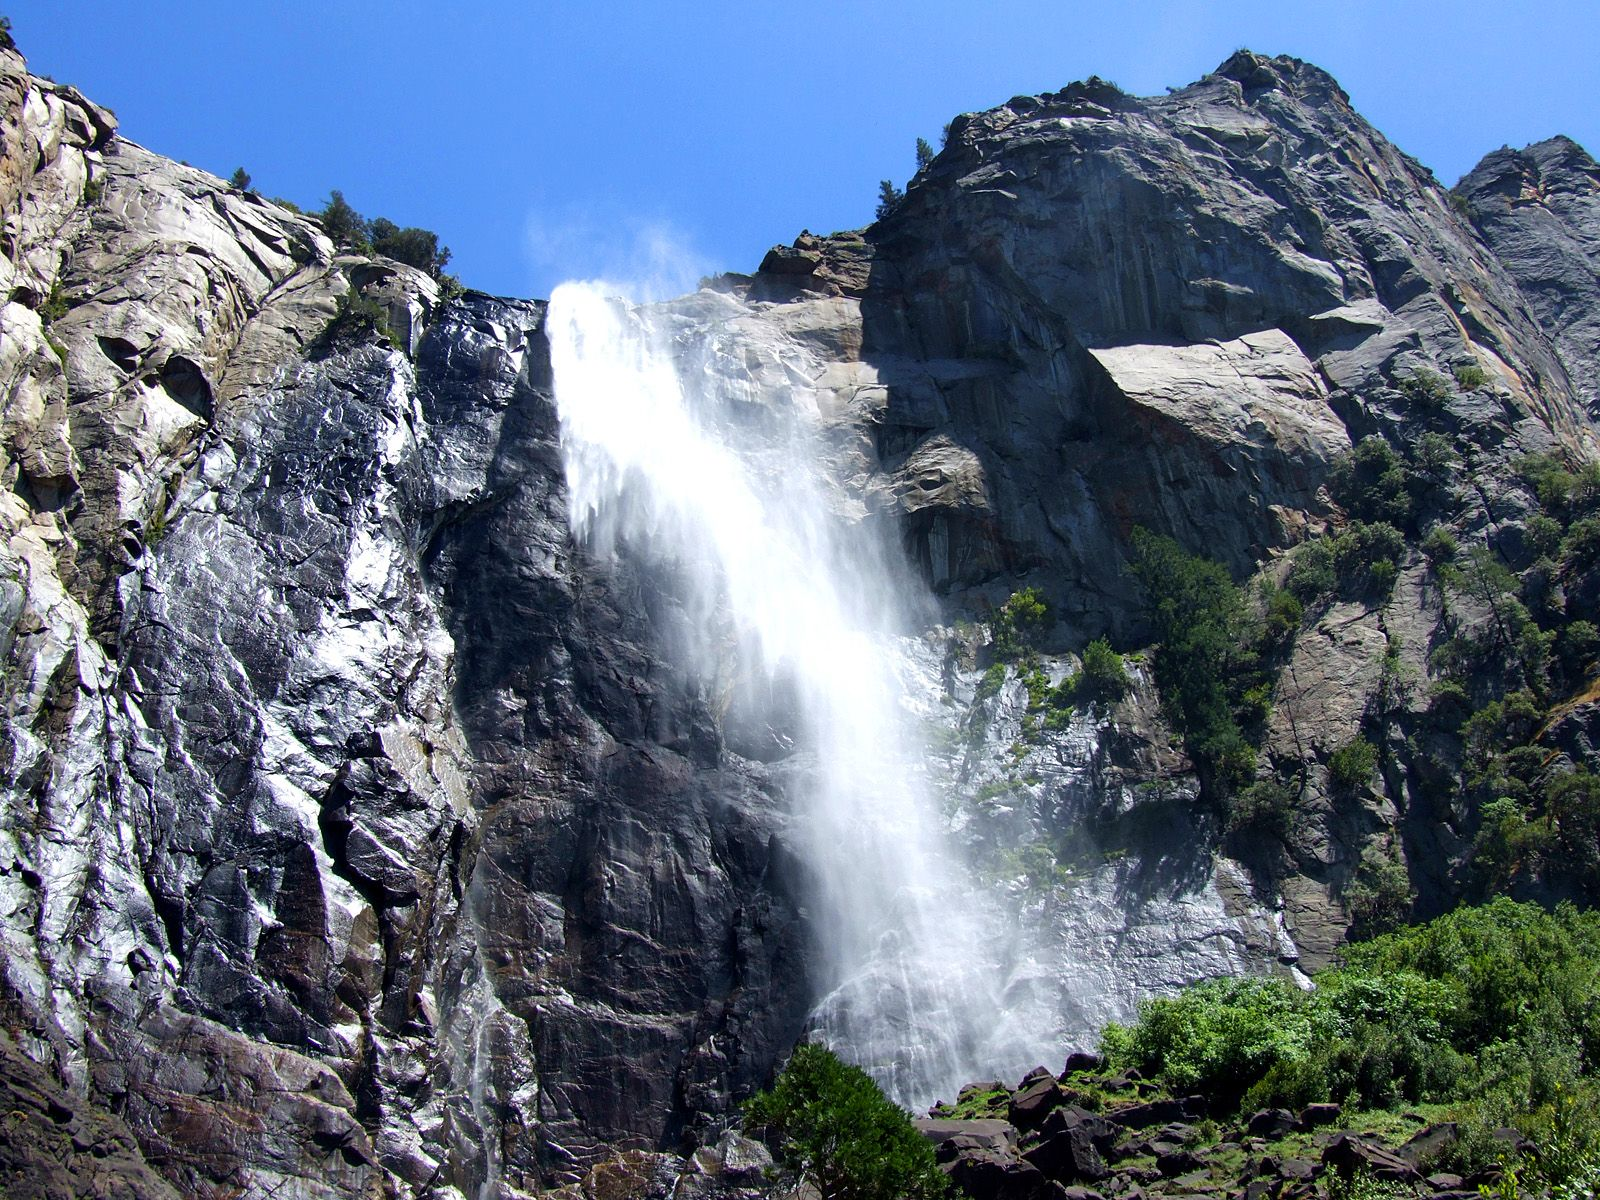 Водопад Брайдлвейл снизу